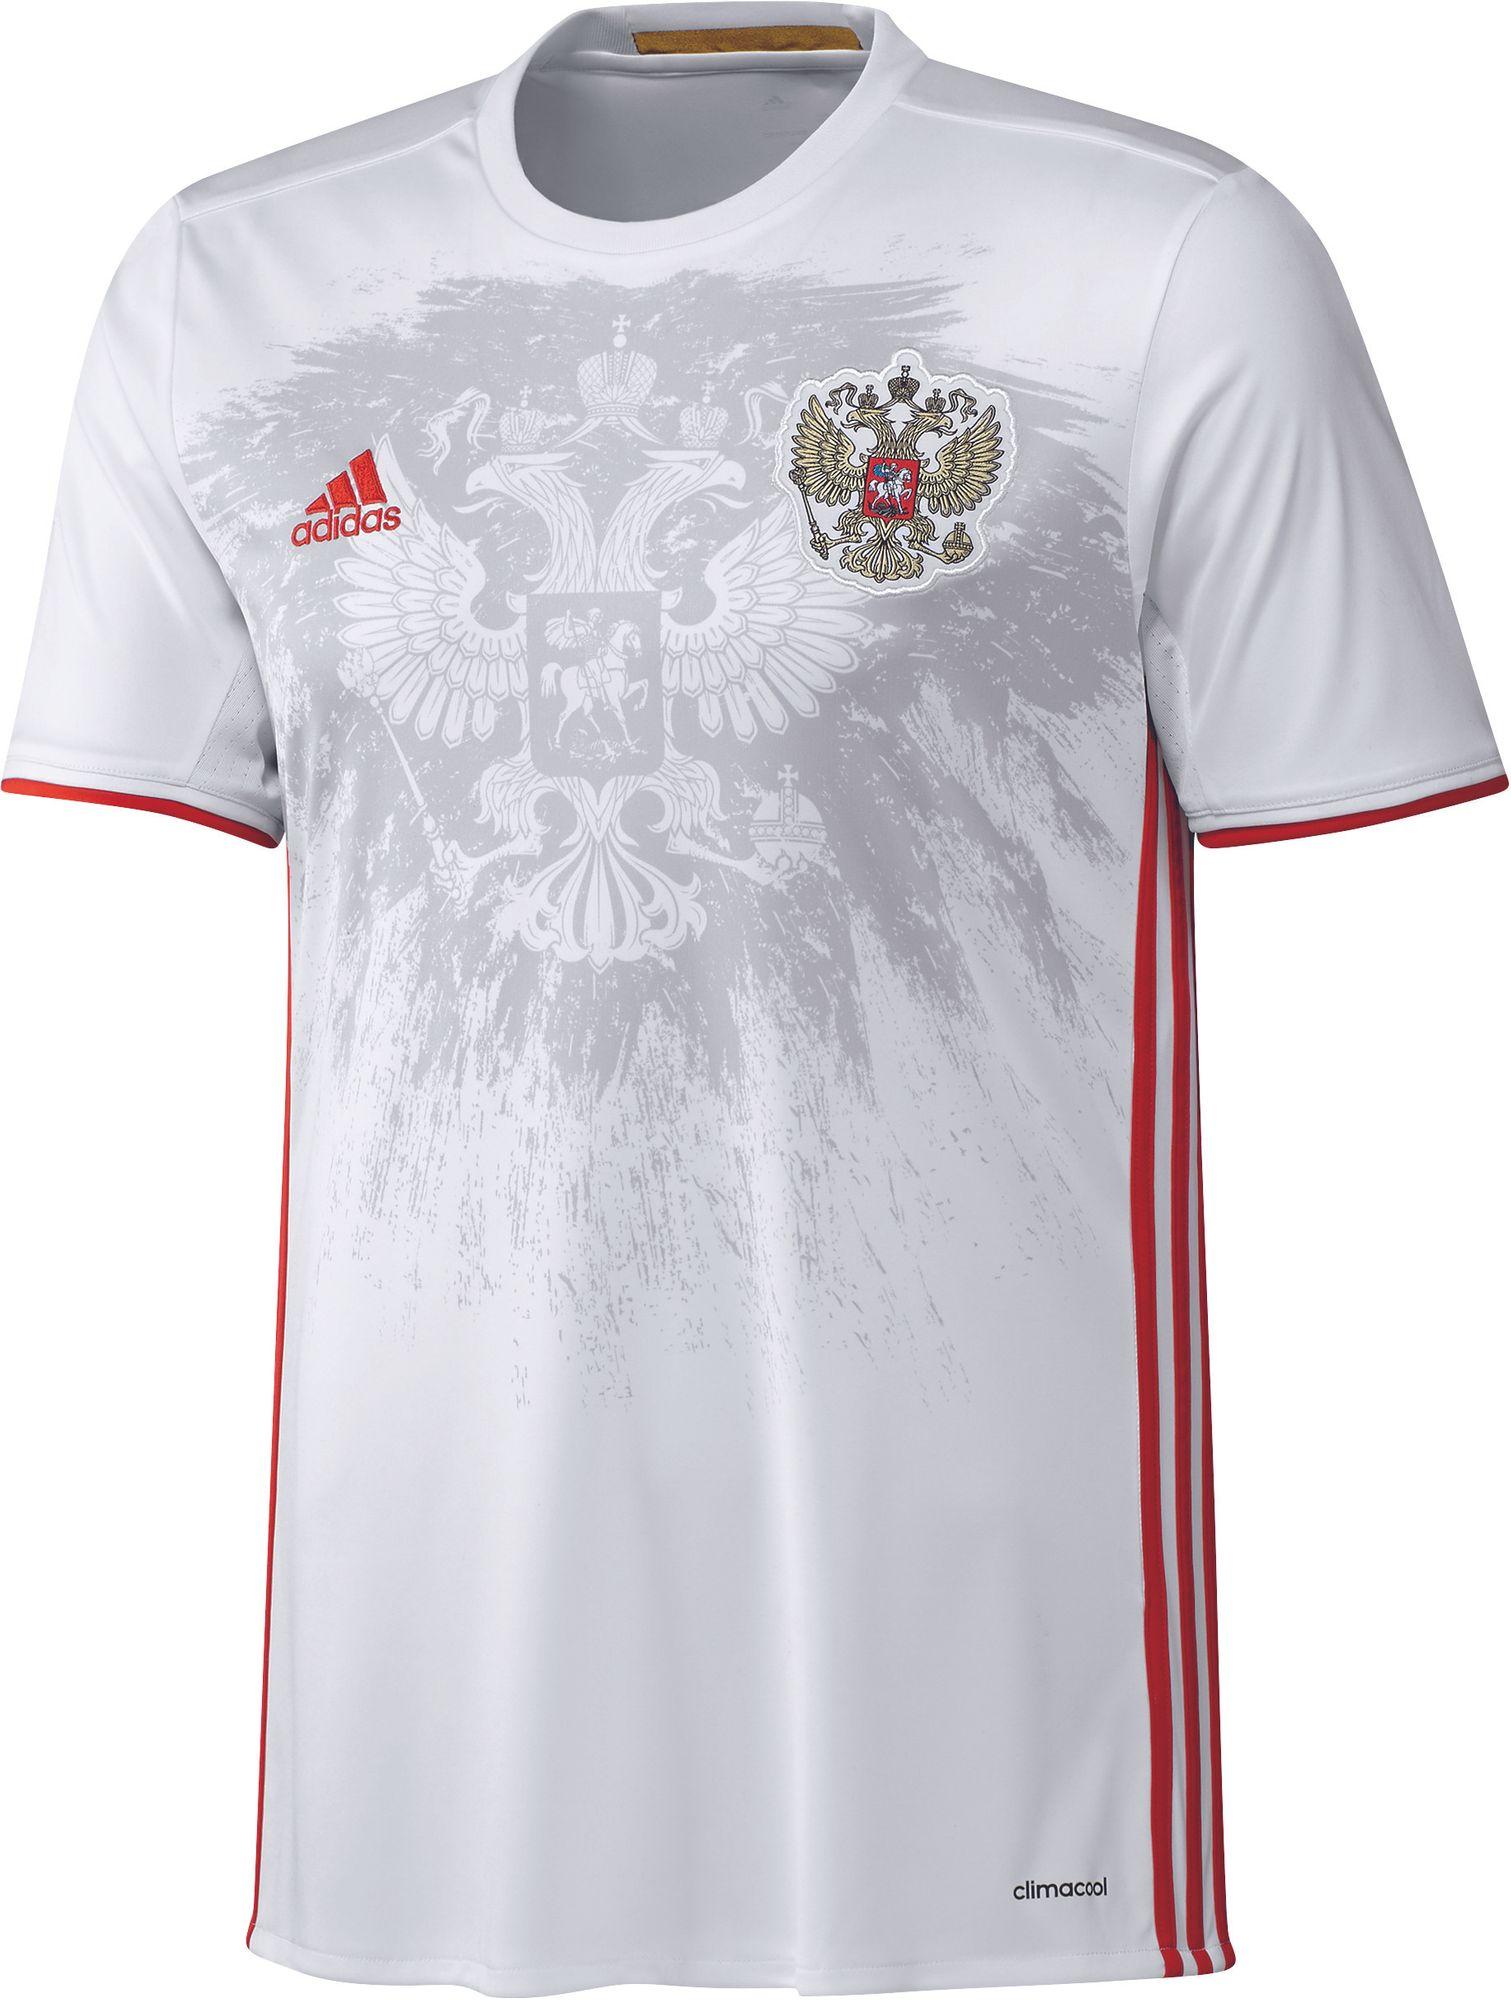 Adidas Russland Trikot Away Kinder Euro 2016 Fantrikots Fanshop